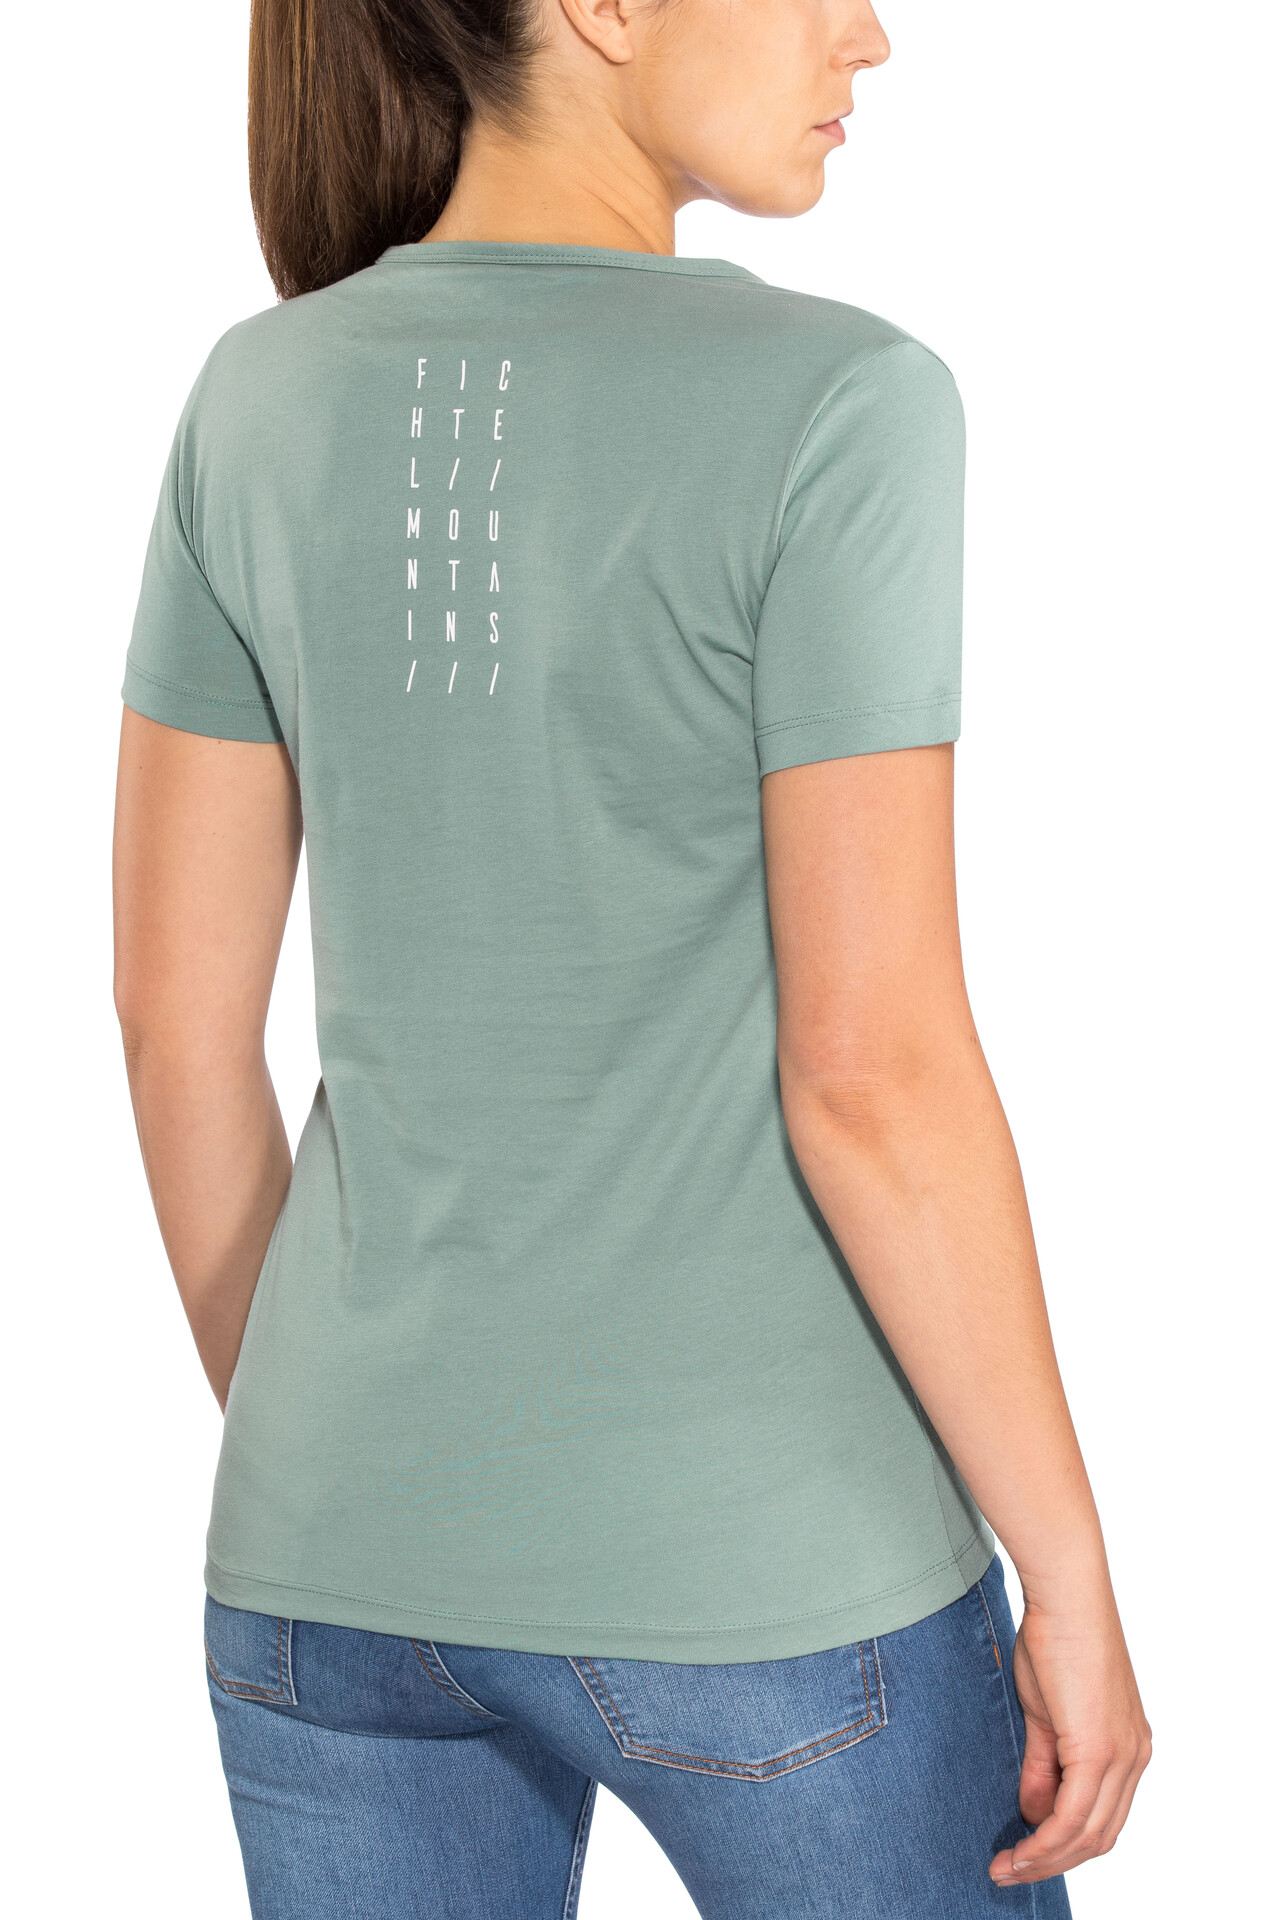 Mint T Fichtelmountains Cube FemmeDark Shirt ywv8ONnm0P